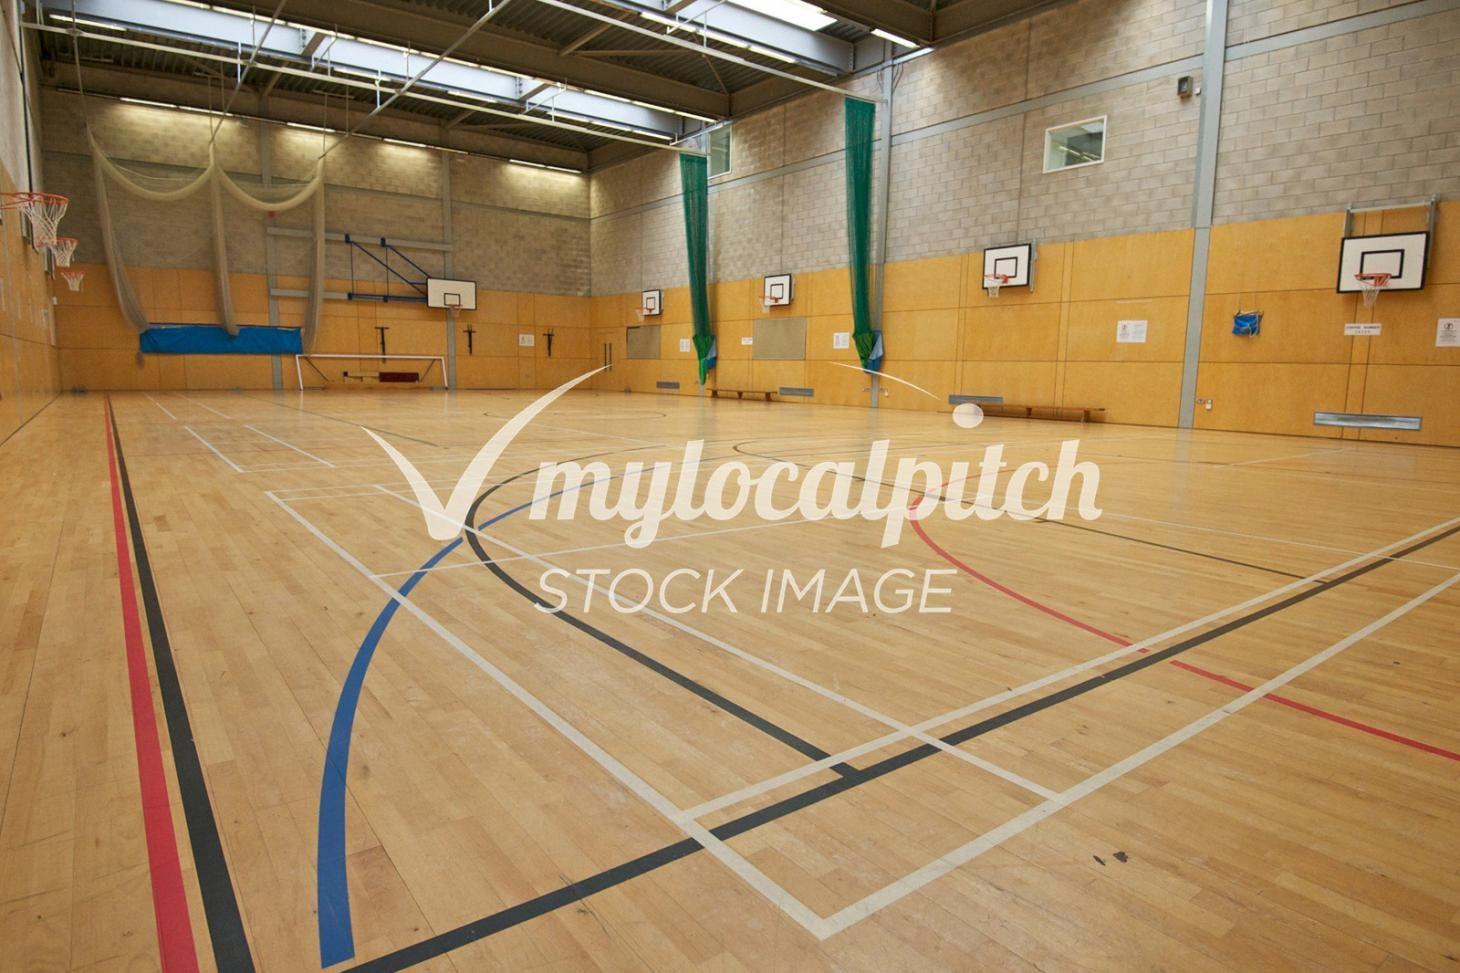 Watford Leisure Centre - Central Indoor basketball court